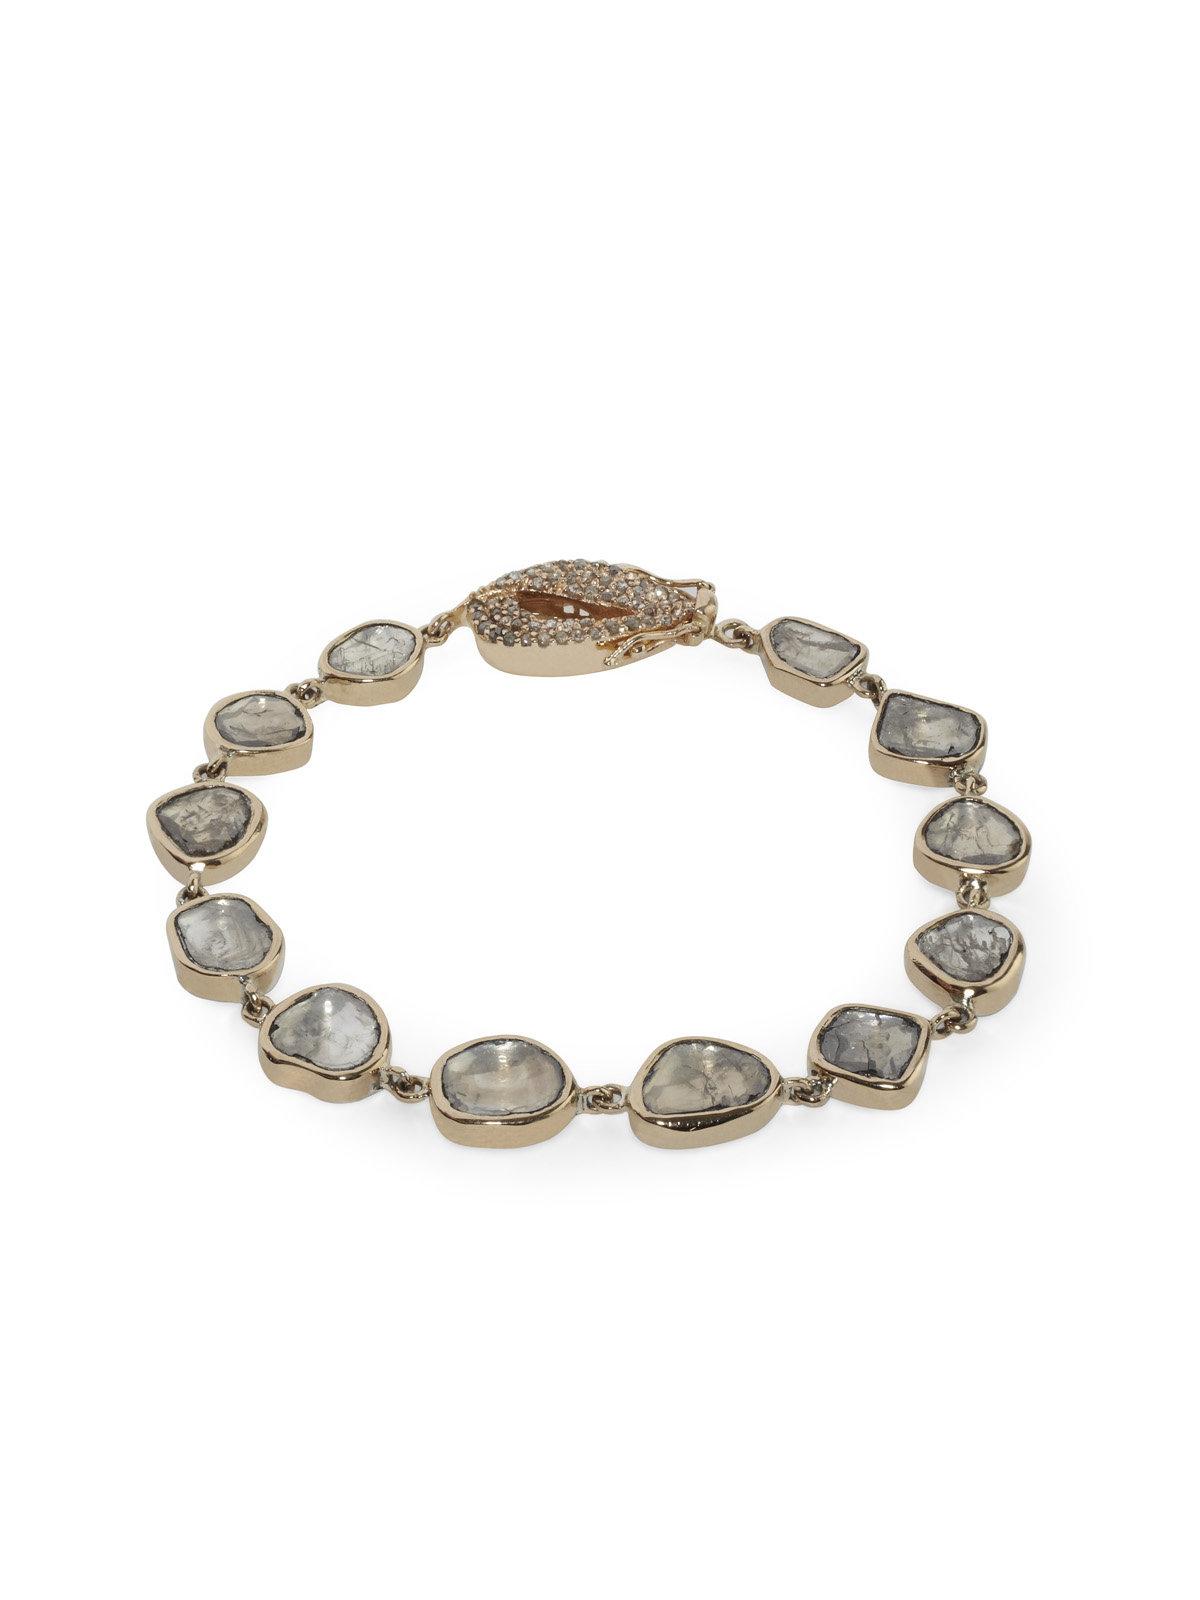 Diamond Anklet With Toe Ring Lc00035 In Anklets From: Maiyet Polki Diamond Strand Bracelet In Metallic